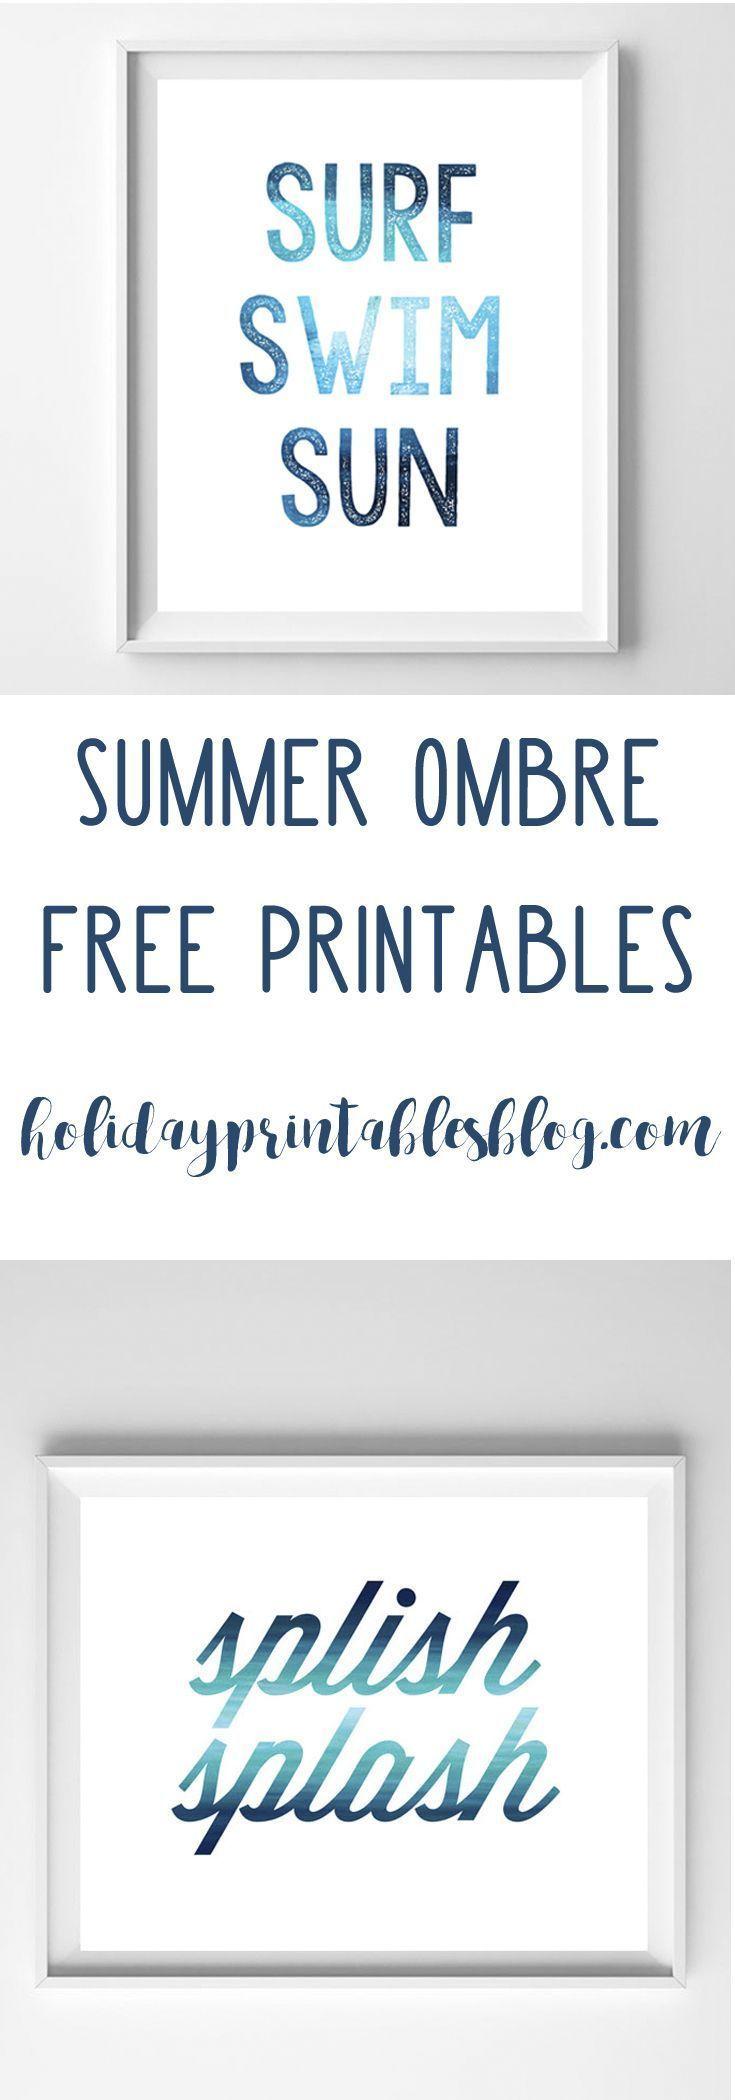 Summer Art | Free Printable Art | Wall Art Ideas | Blue Ombre | Coastal Decor | Beach House | Free Printables